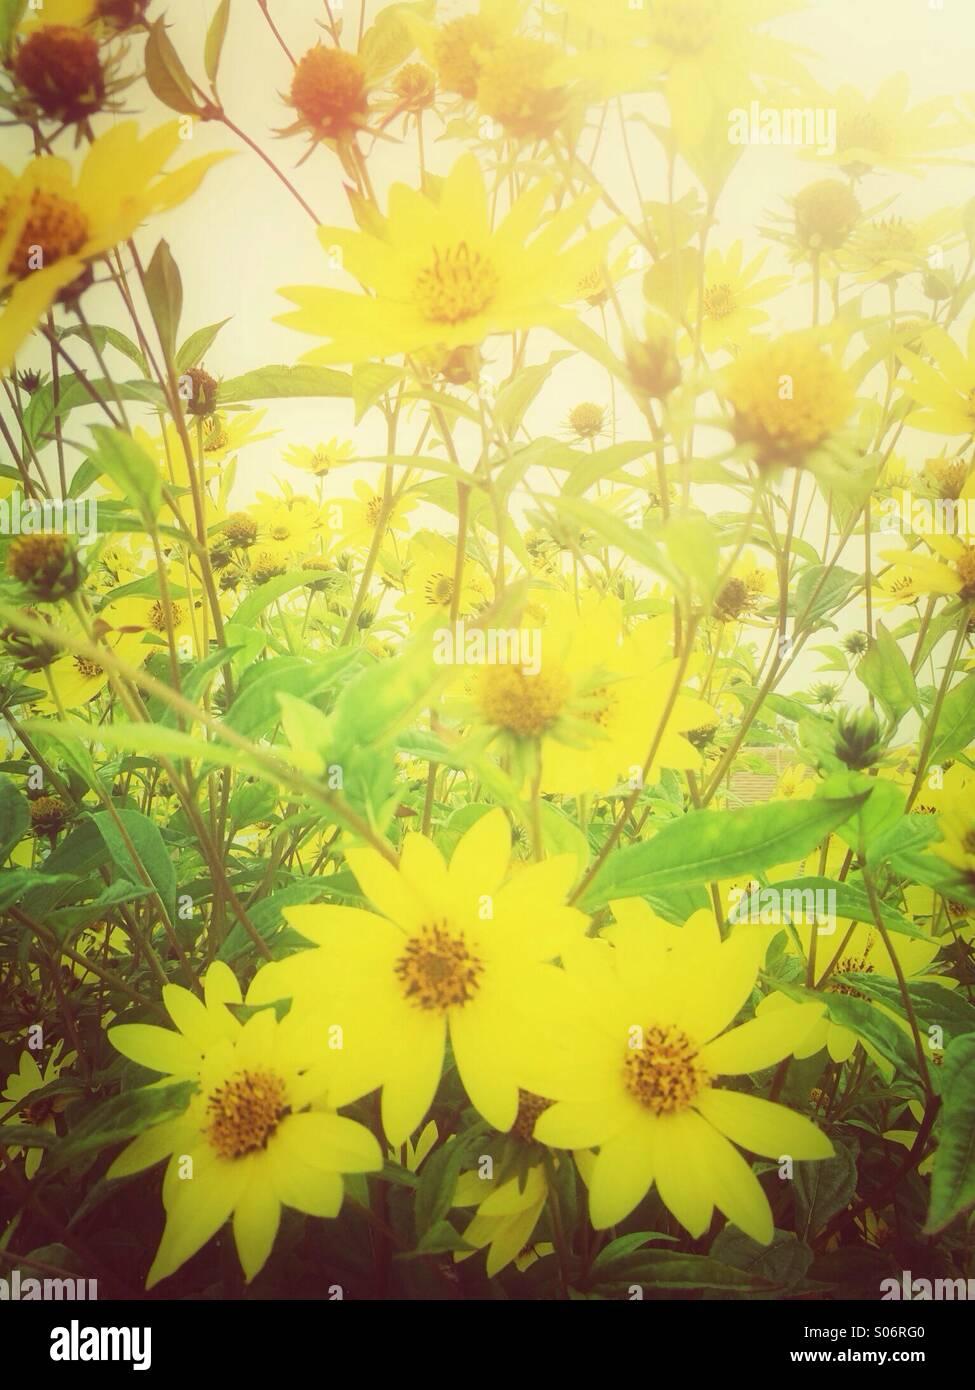 Daisy flores amarillas Imagen De Stock